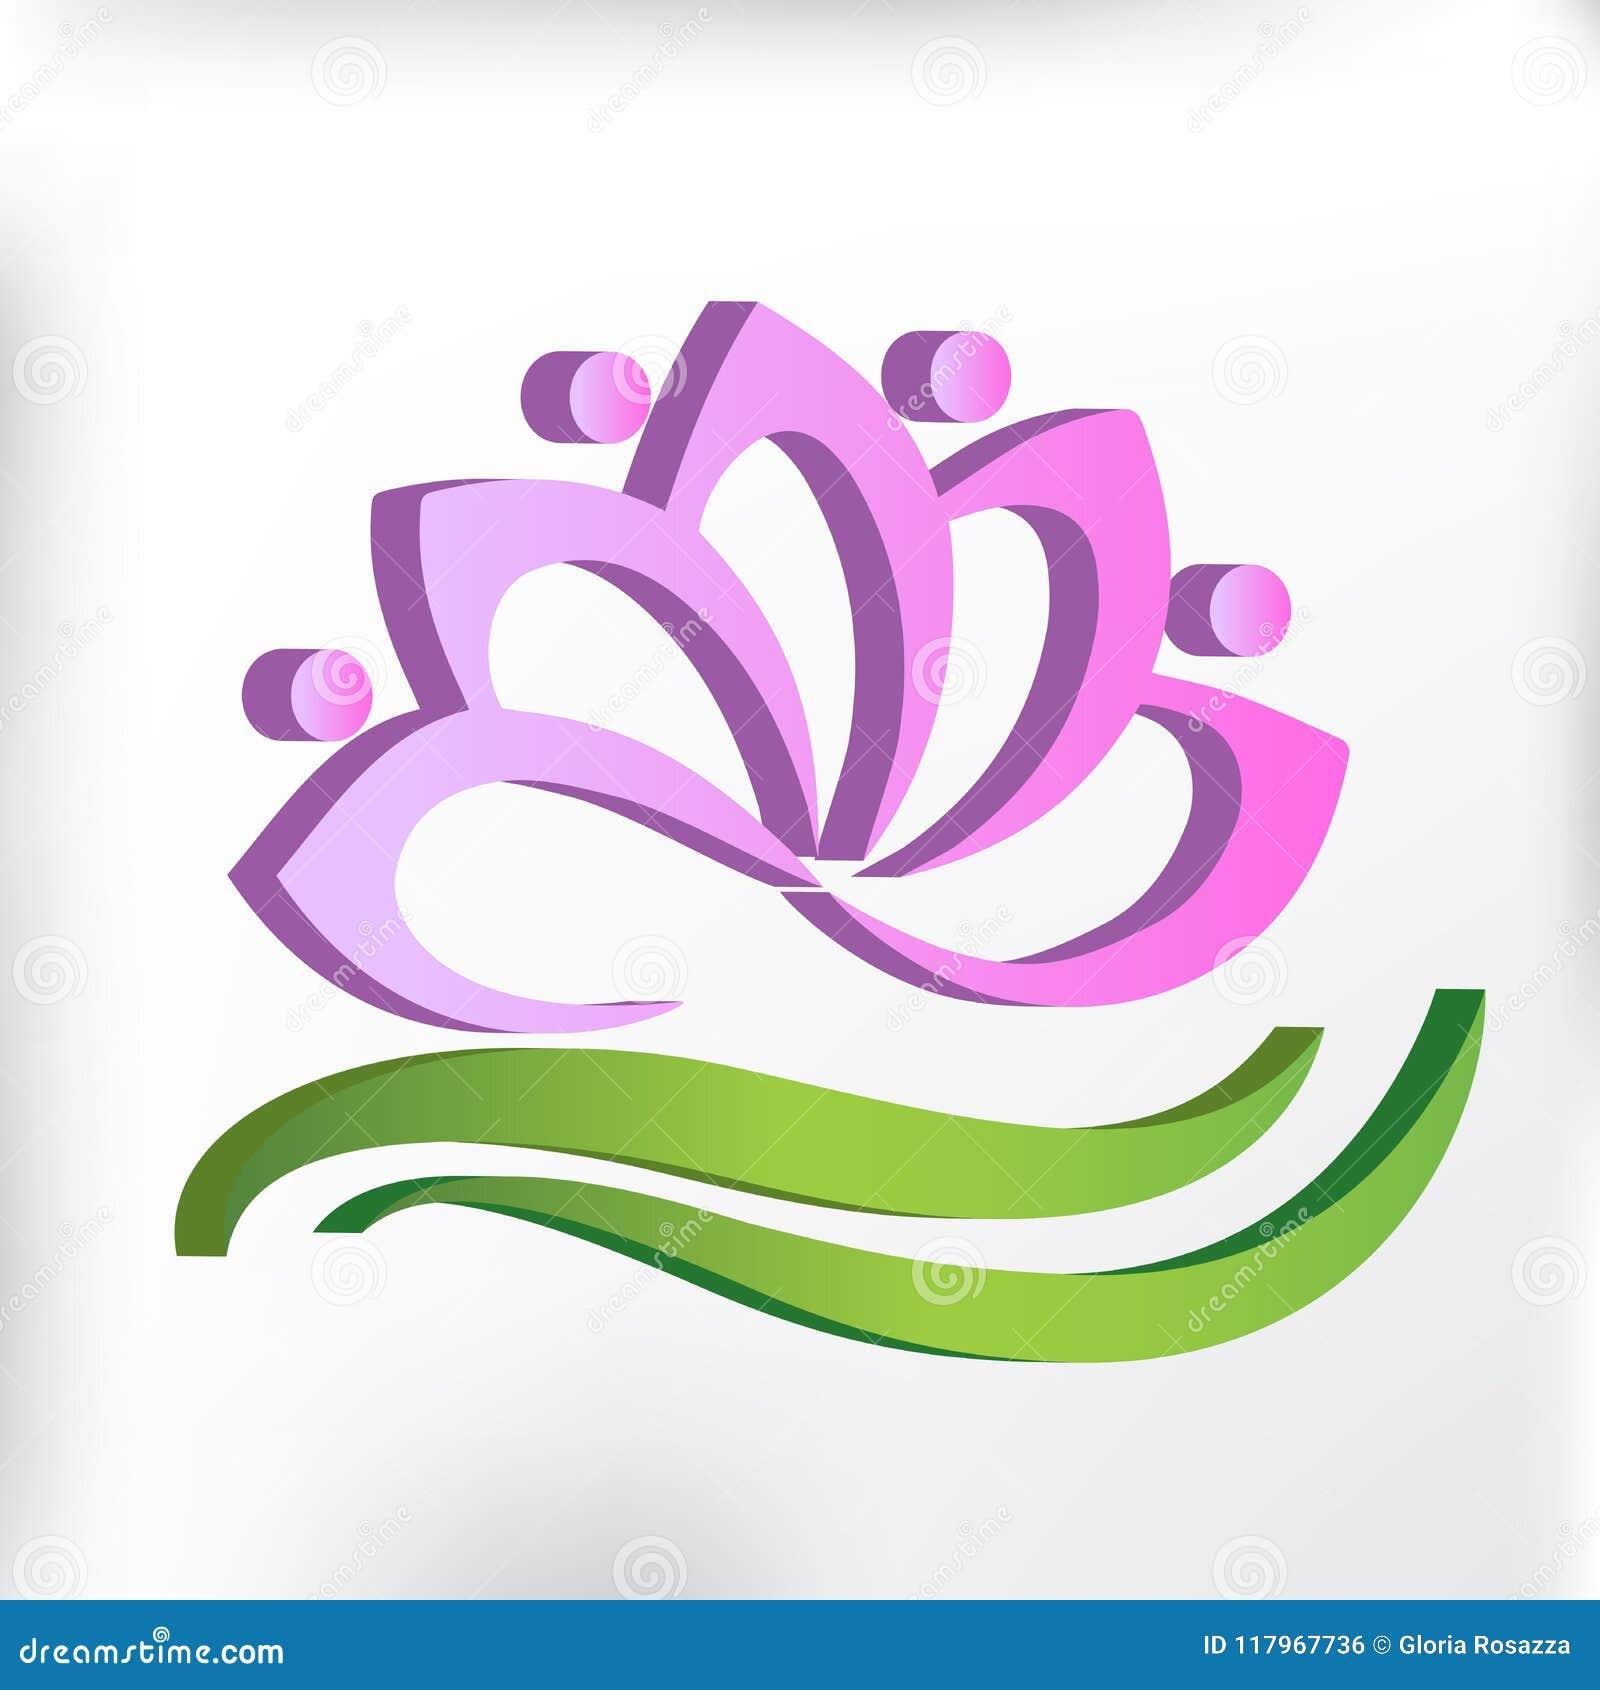 Logo Pink Lotus 3d Flower Teamwork Symbol Of Yoga Vector Image